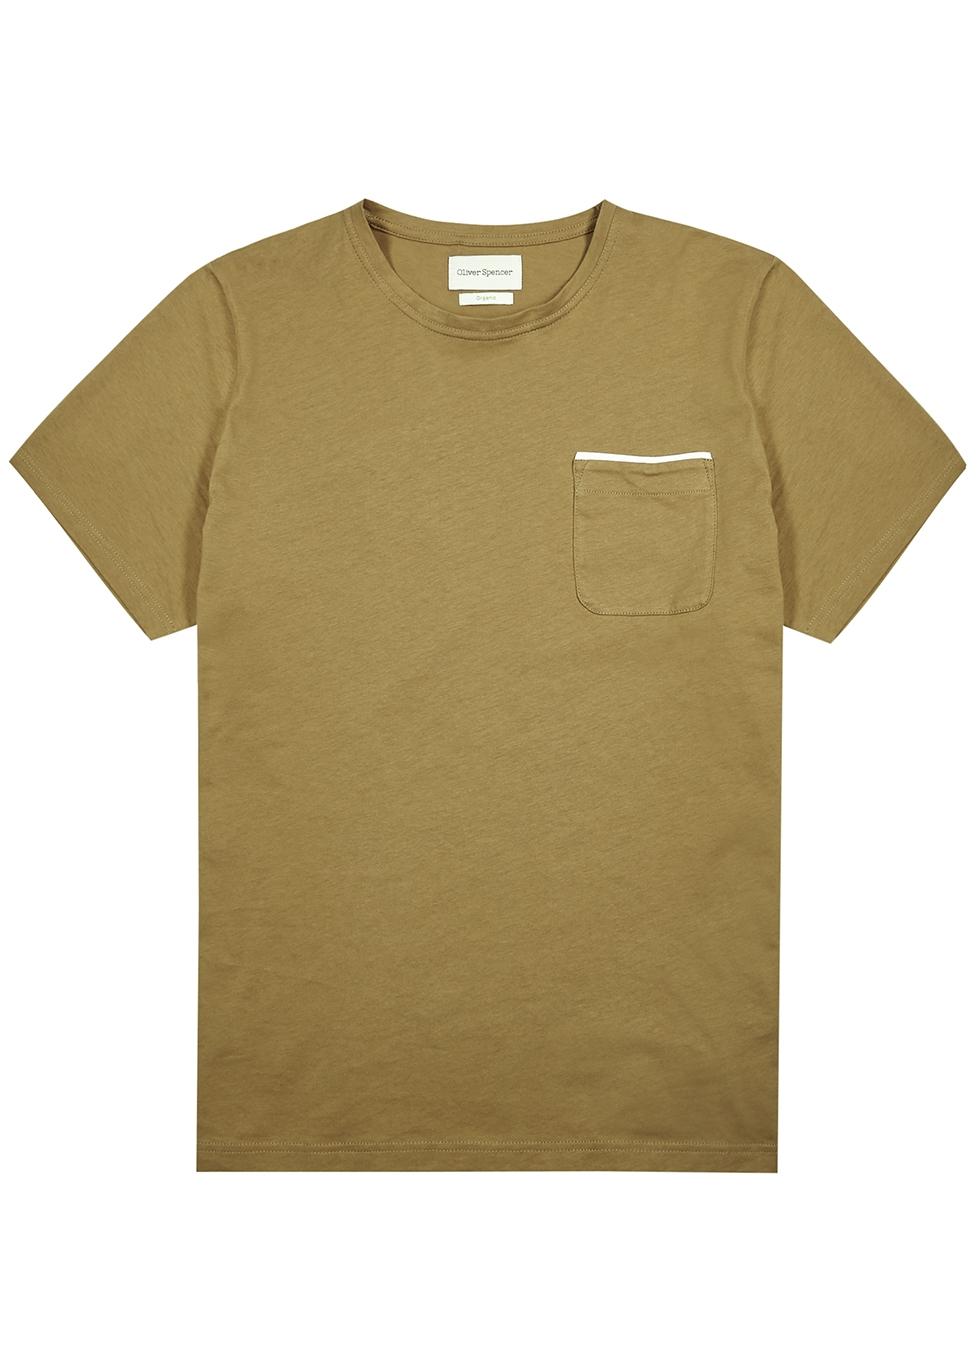 Warren olive cotton T-shirt